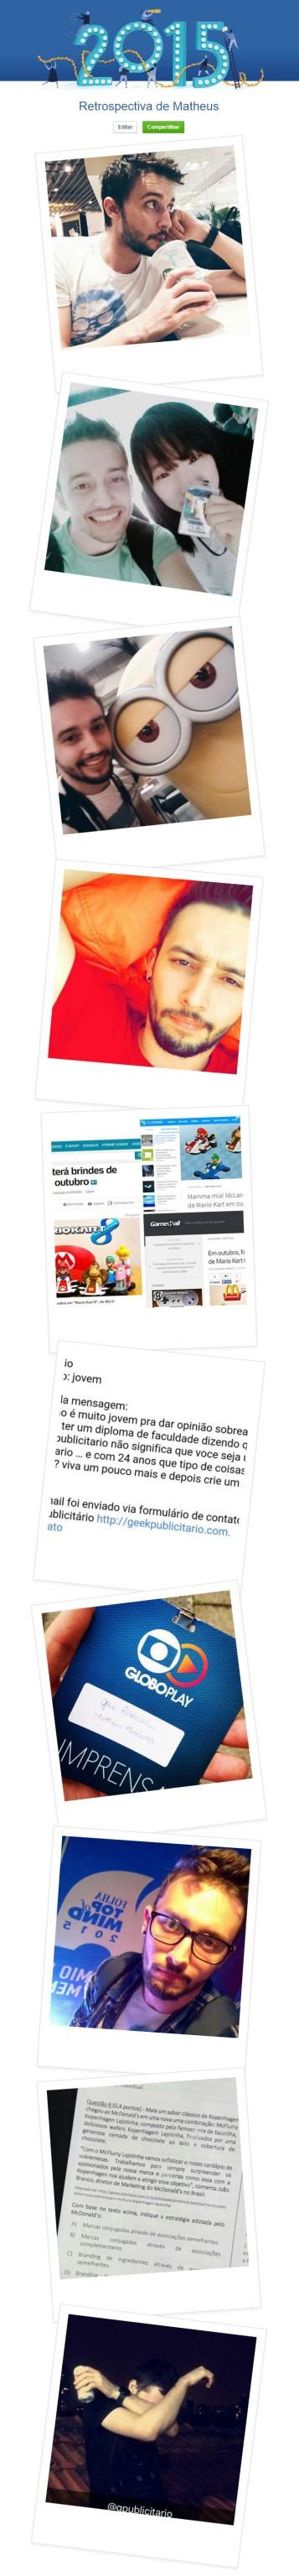 retrospectiva-facebook-2015-matheus-ferreira-blog-geek-publicitario